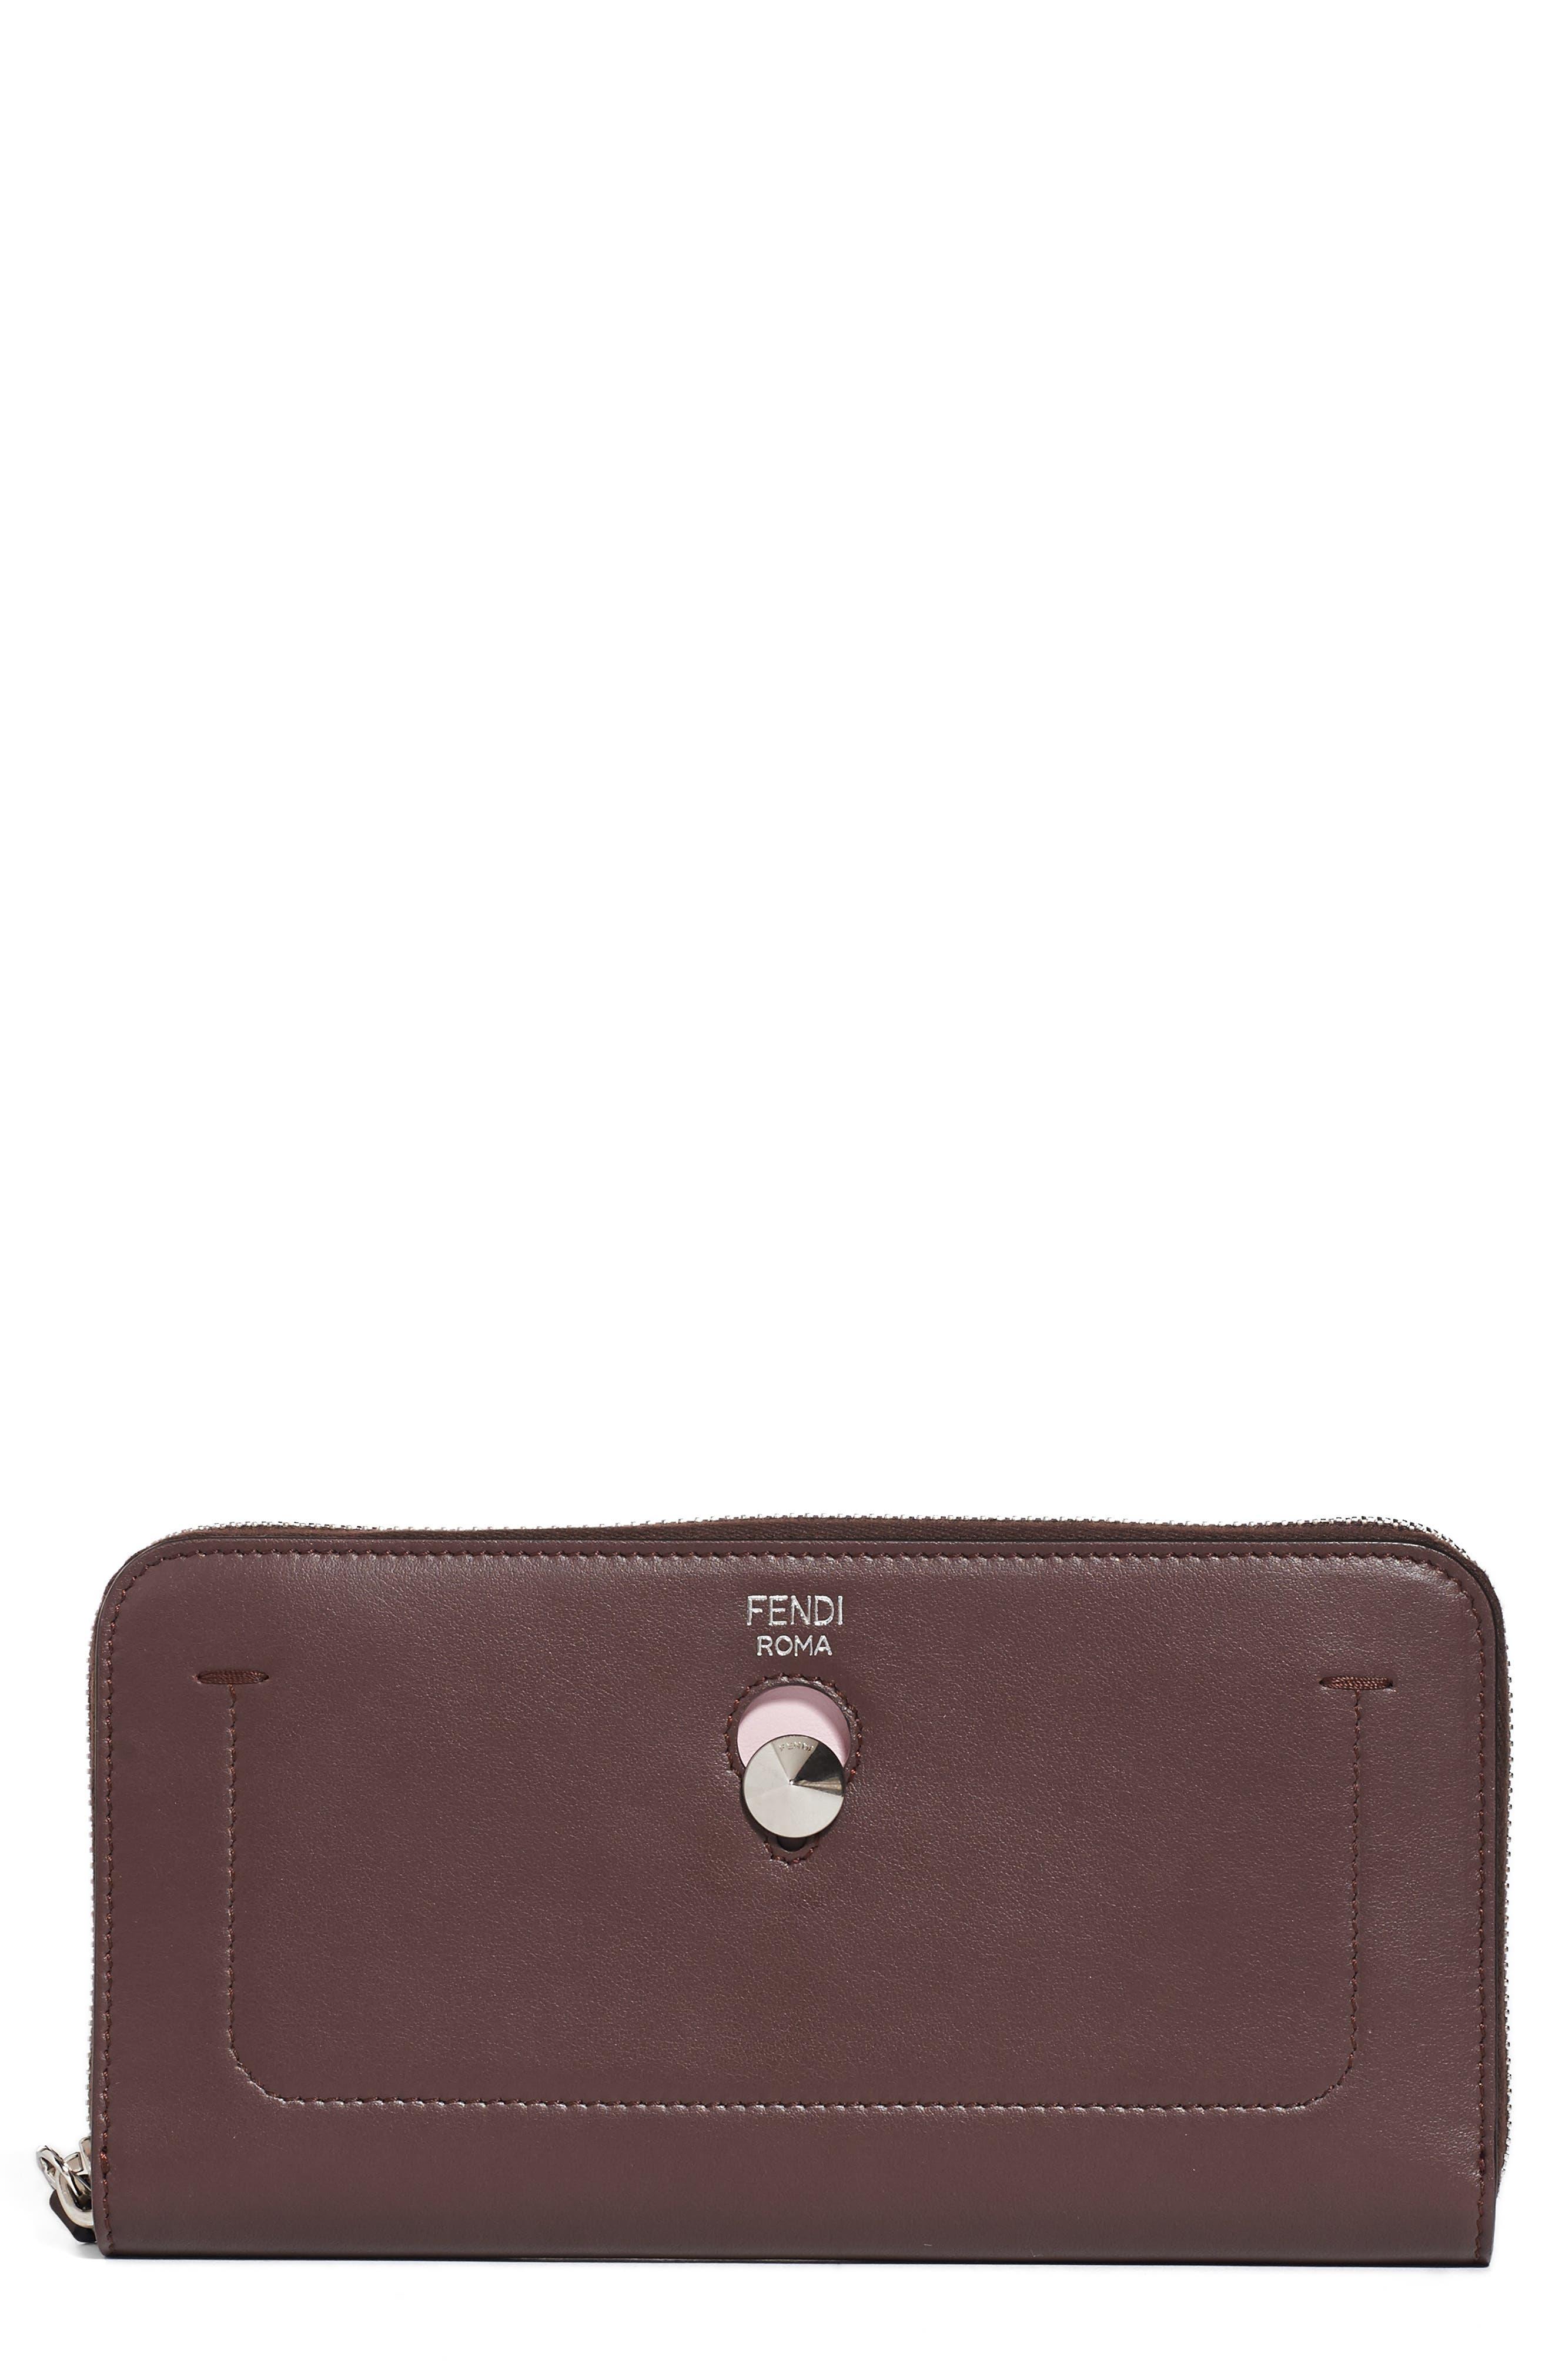 FENDI Dotcom Calfskin Leather Clutch Wallet